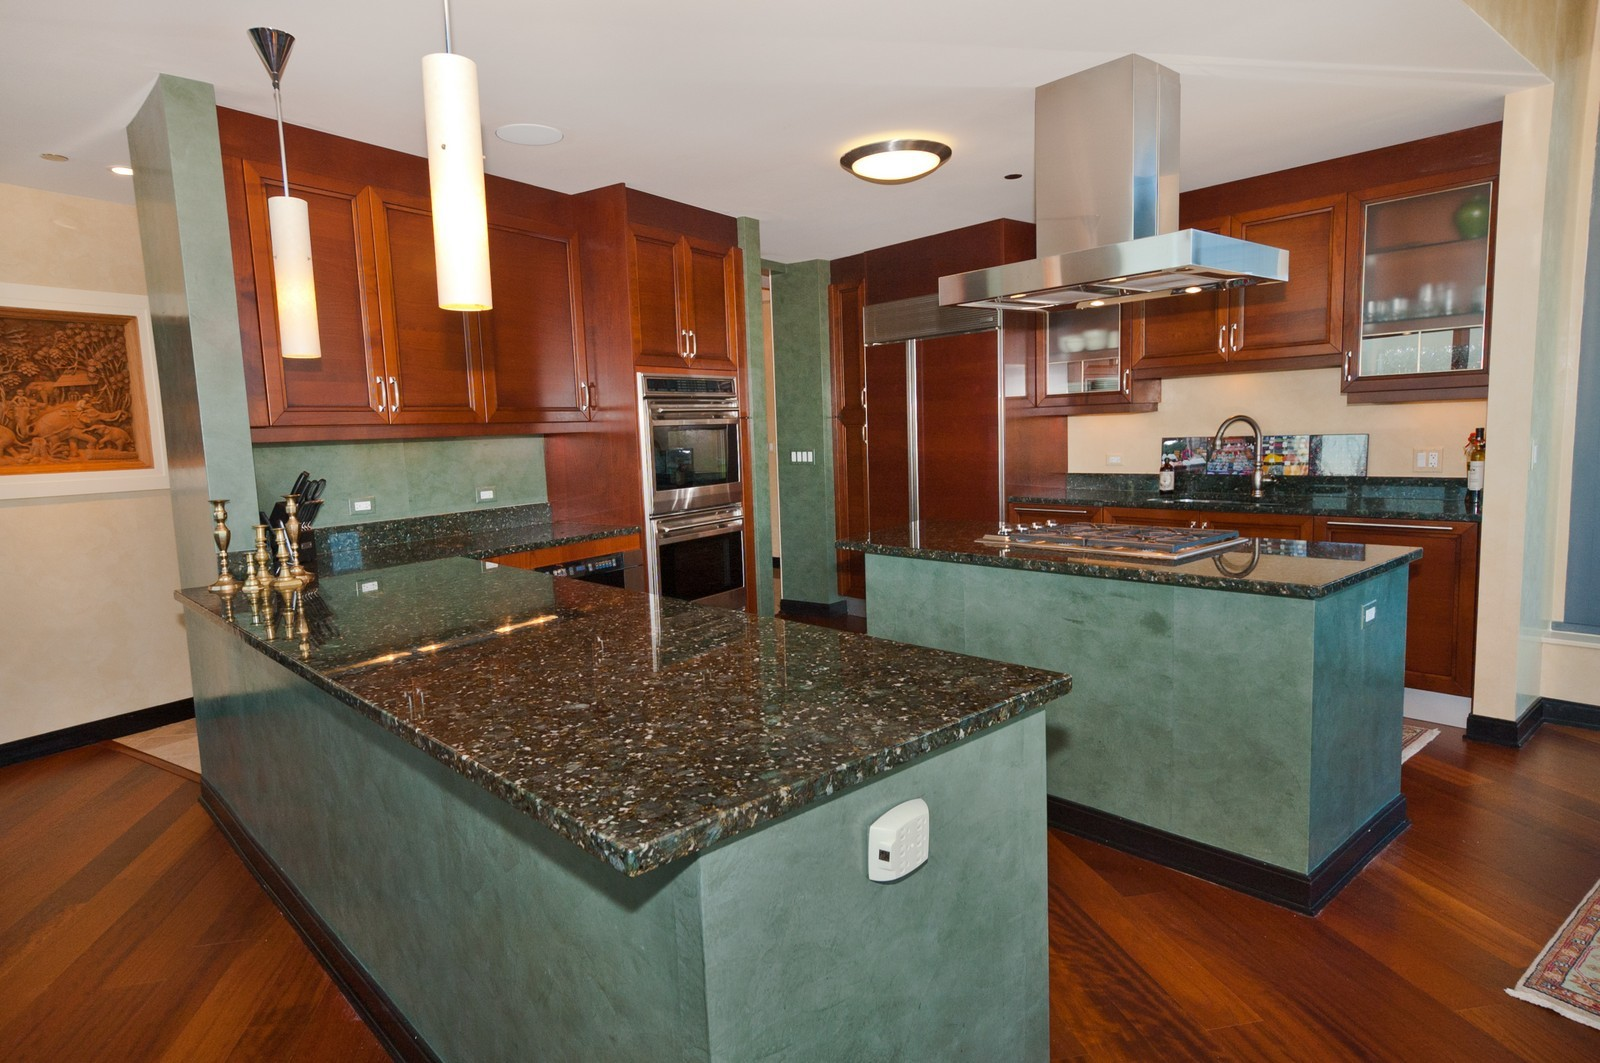 Real Estate Photography - 60 E. Monroe, 5901, Chicago, IL, 60603 - Kitchen 1